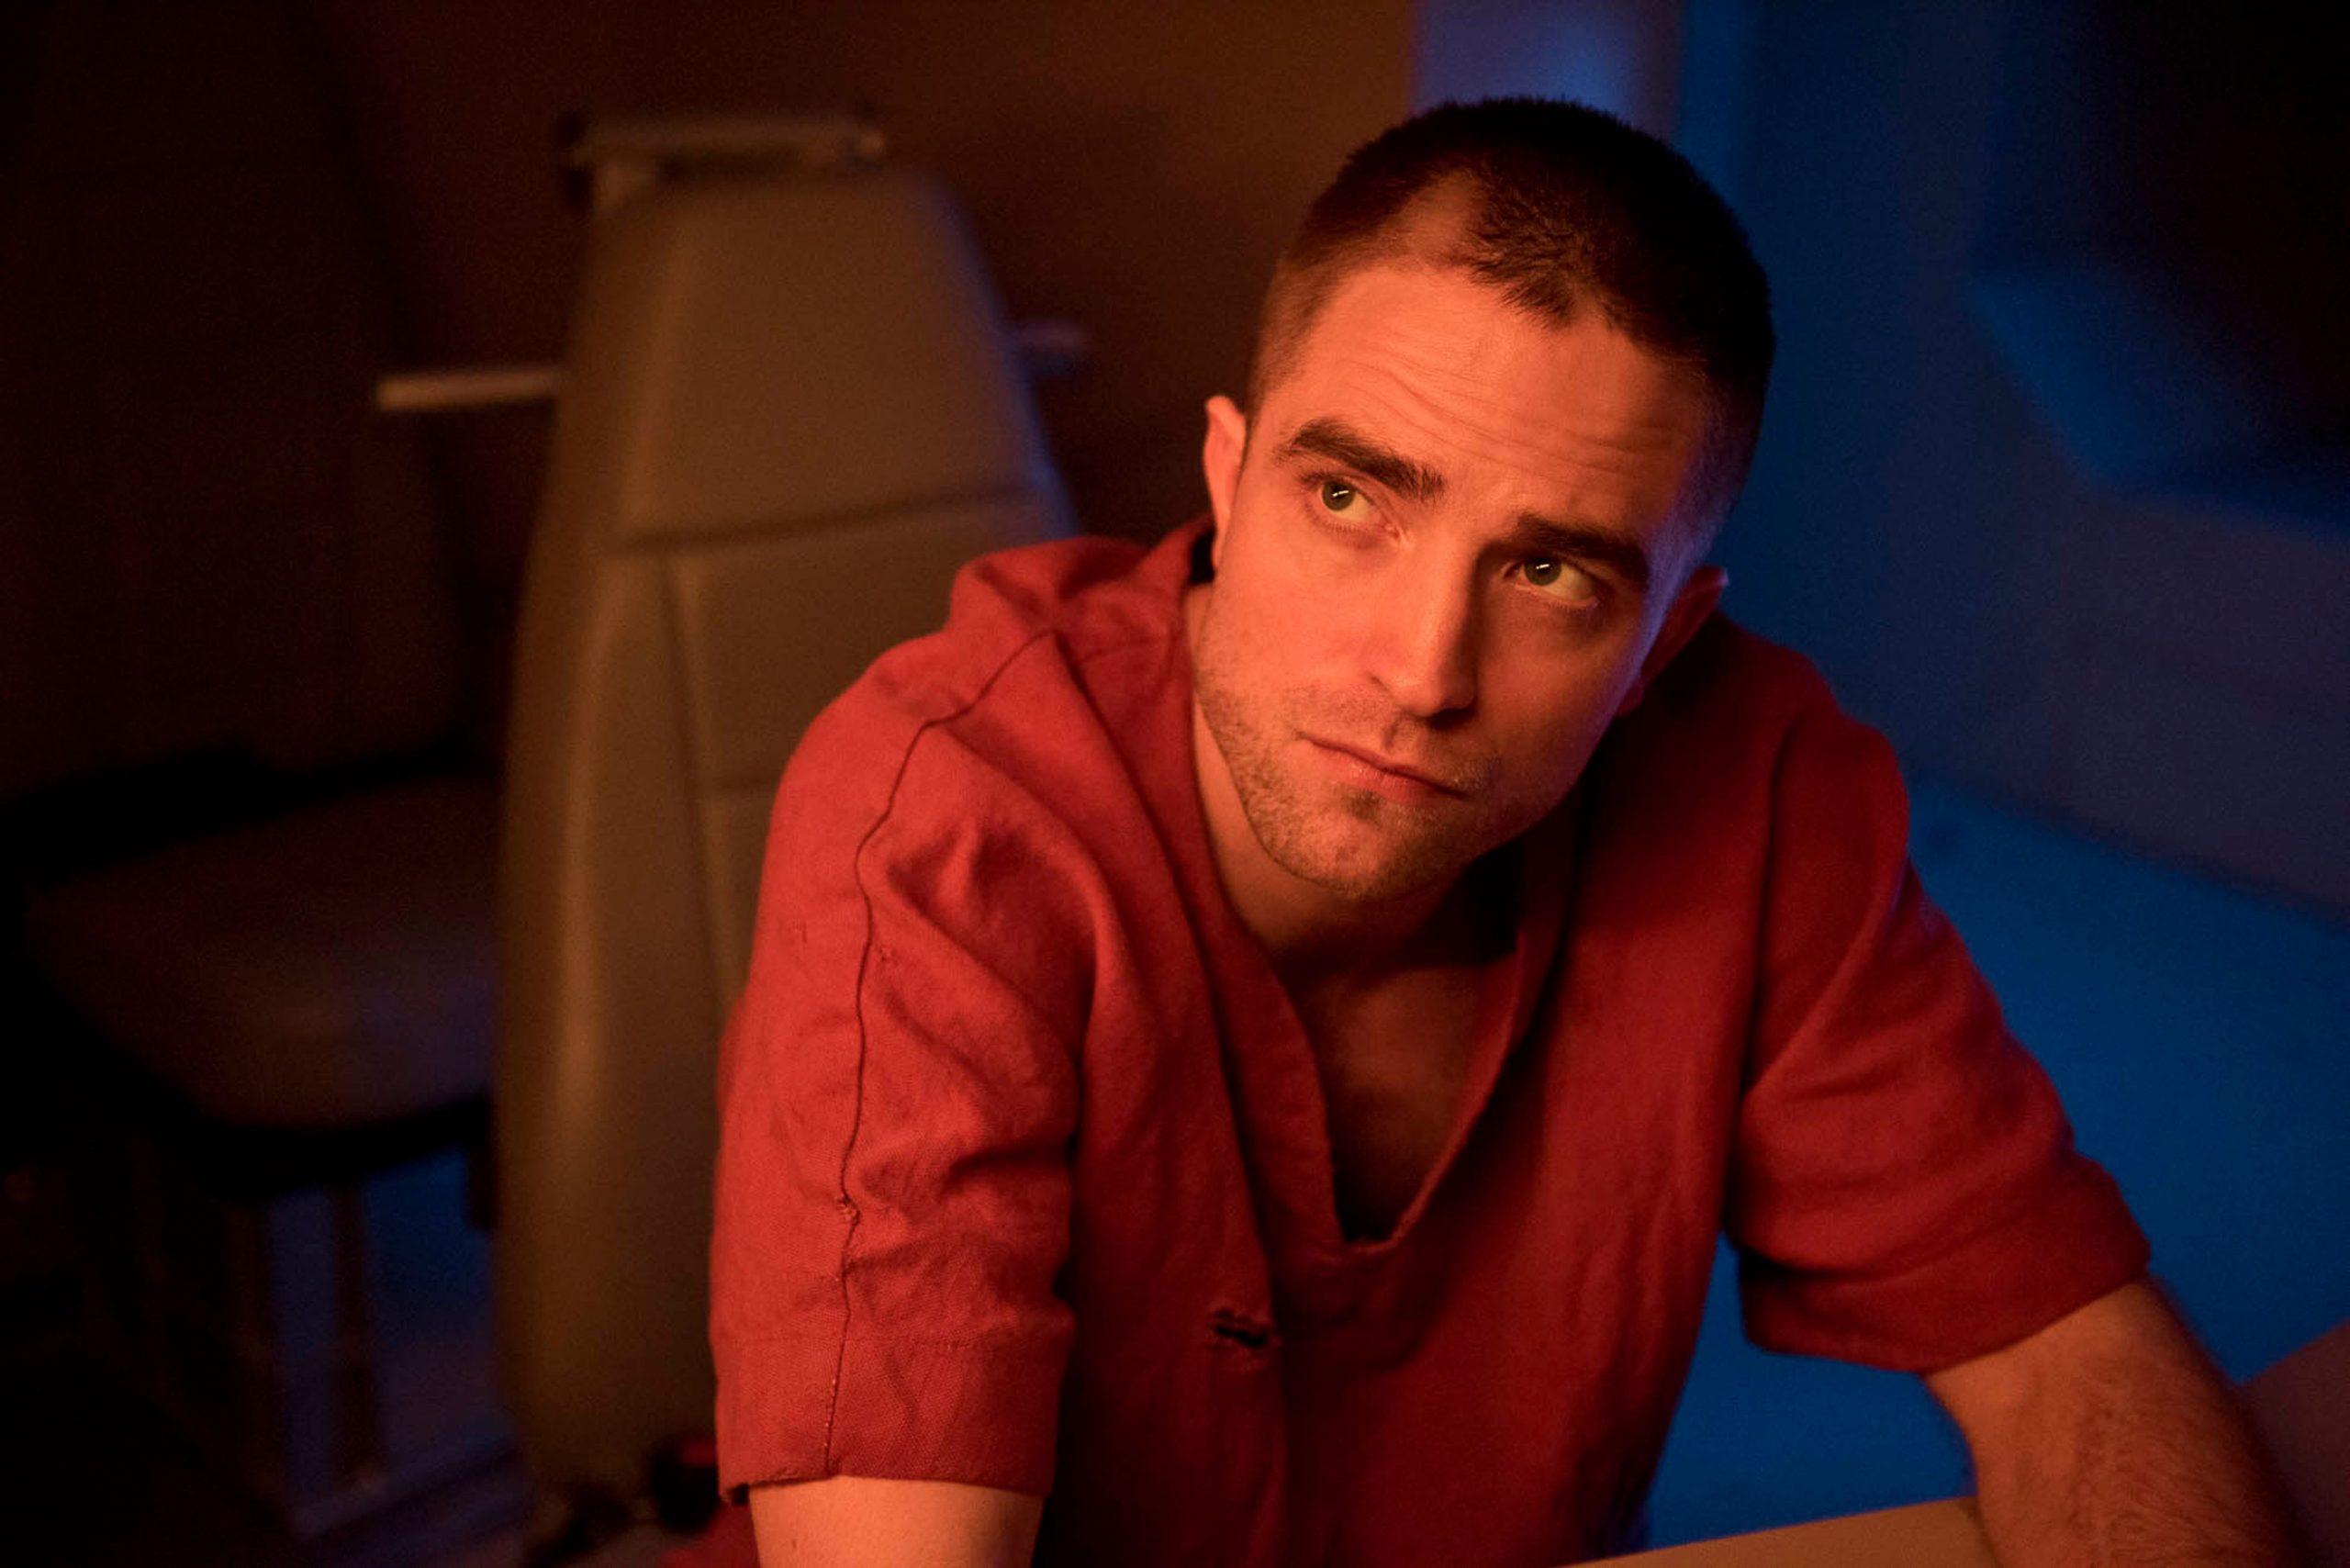 Robert Pattinson Workout Routine 2